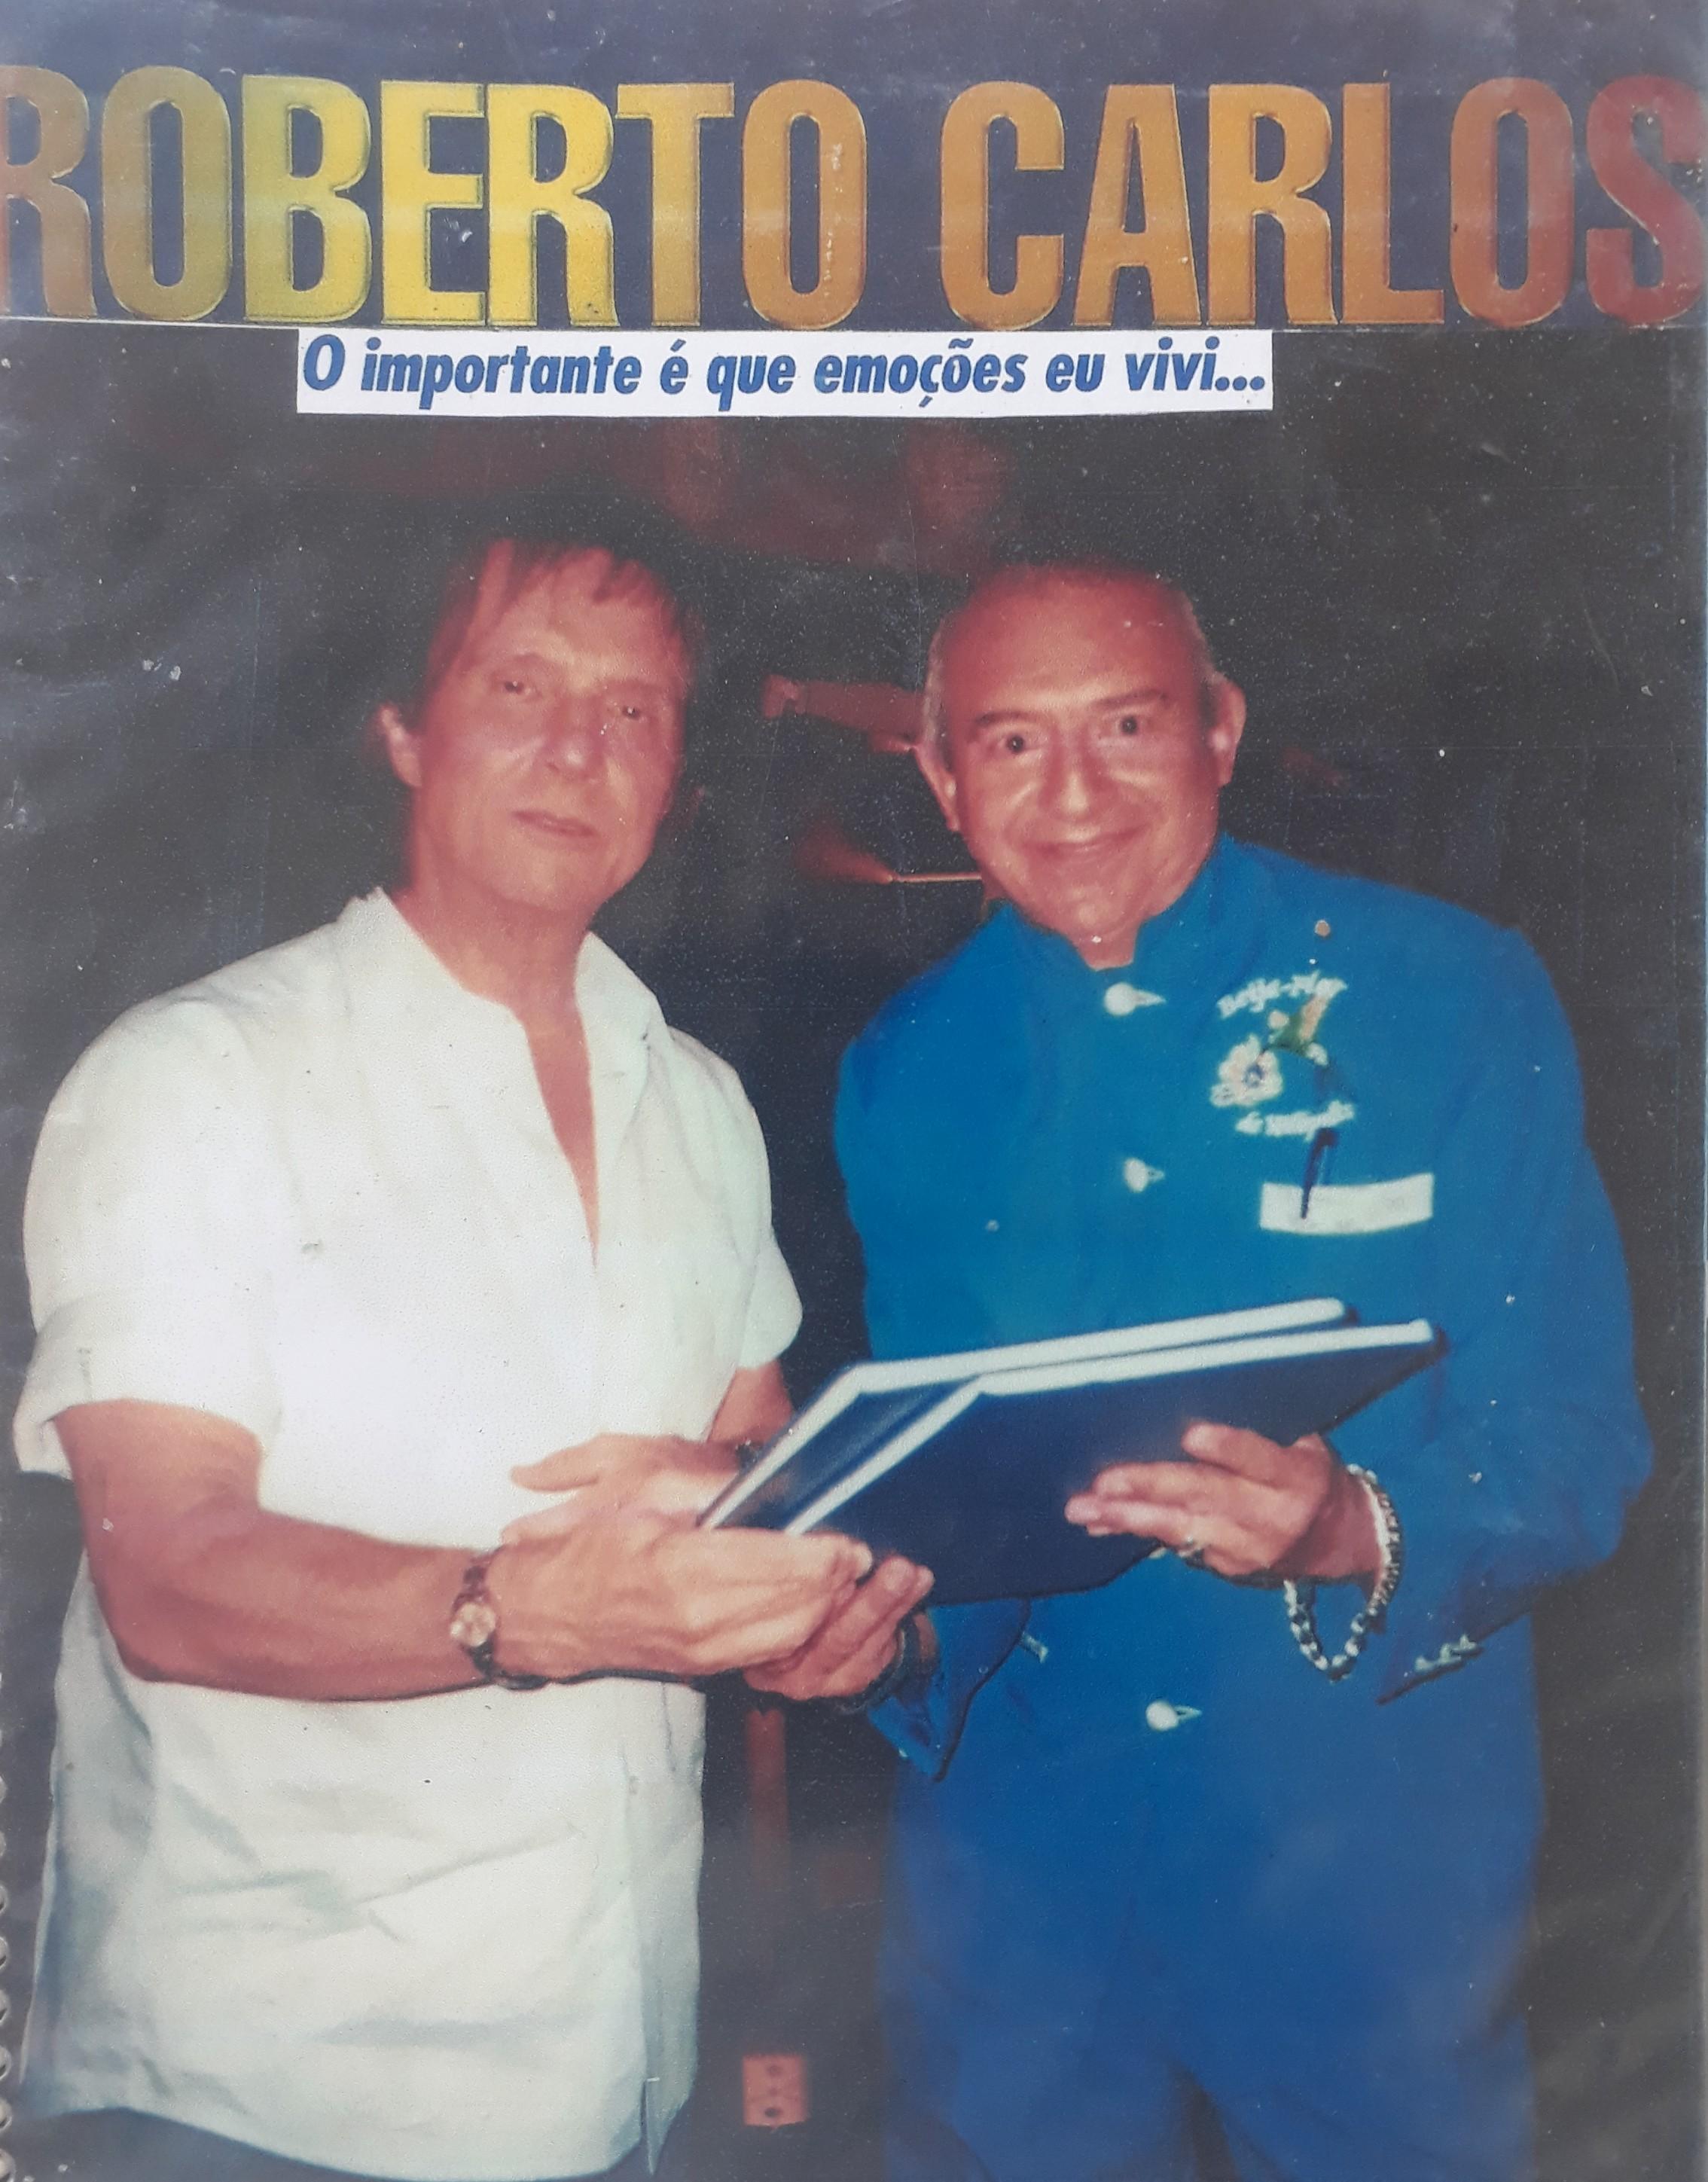 José Maria da Silva souza Souza